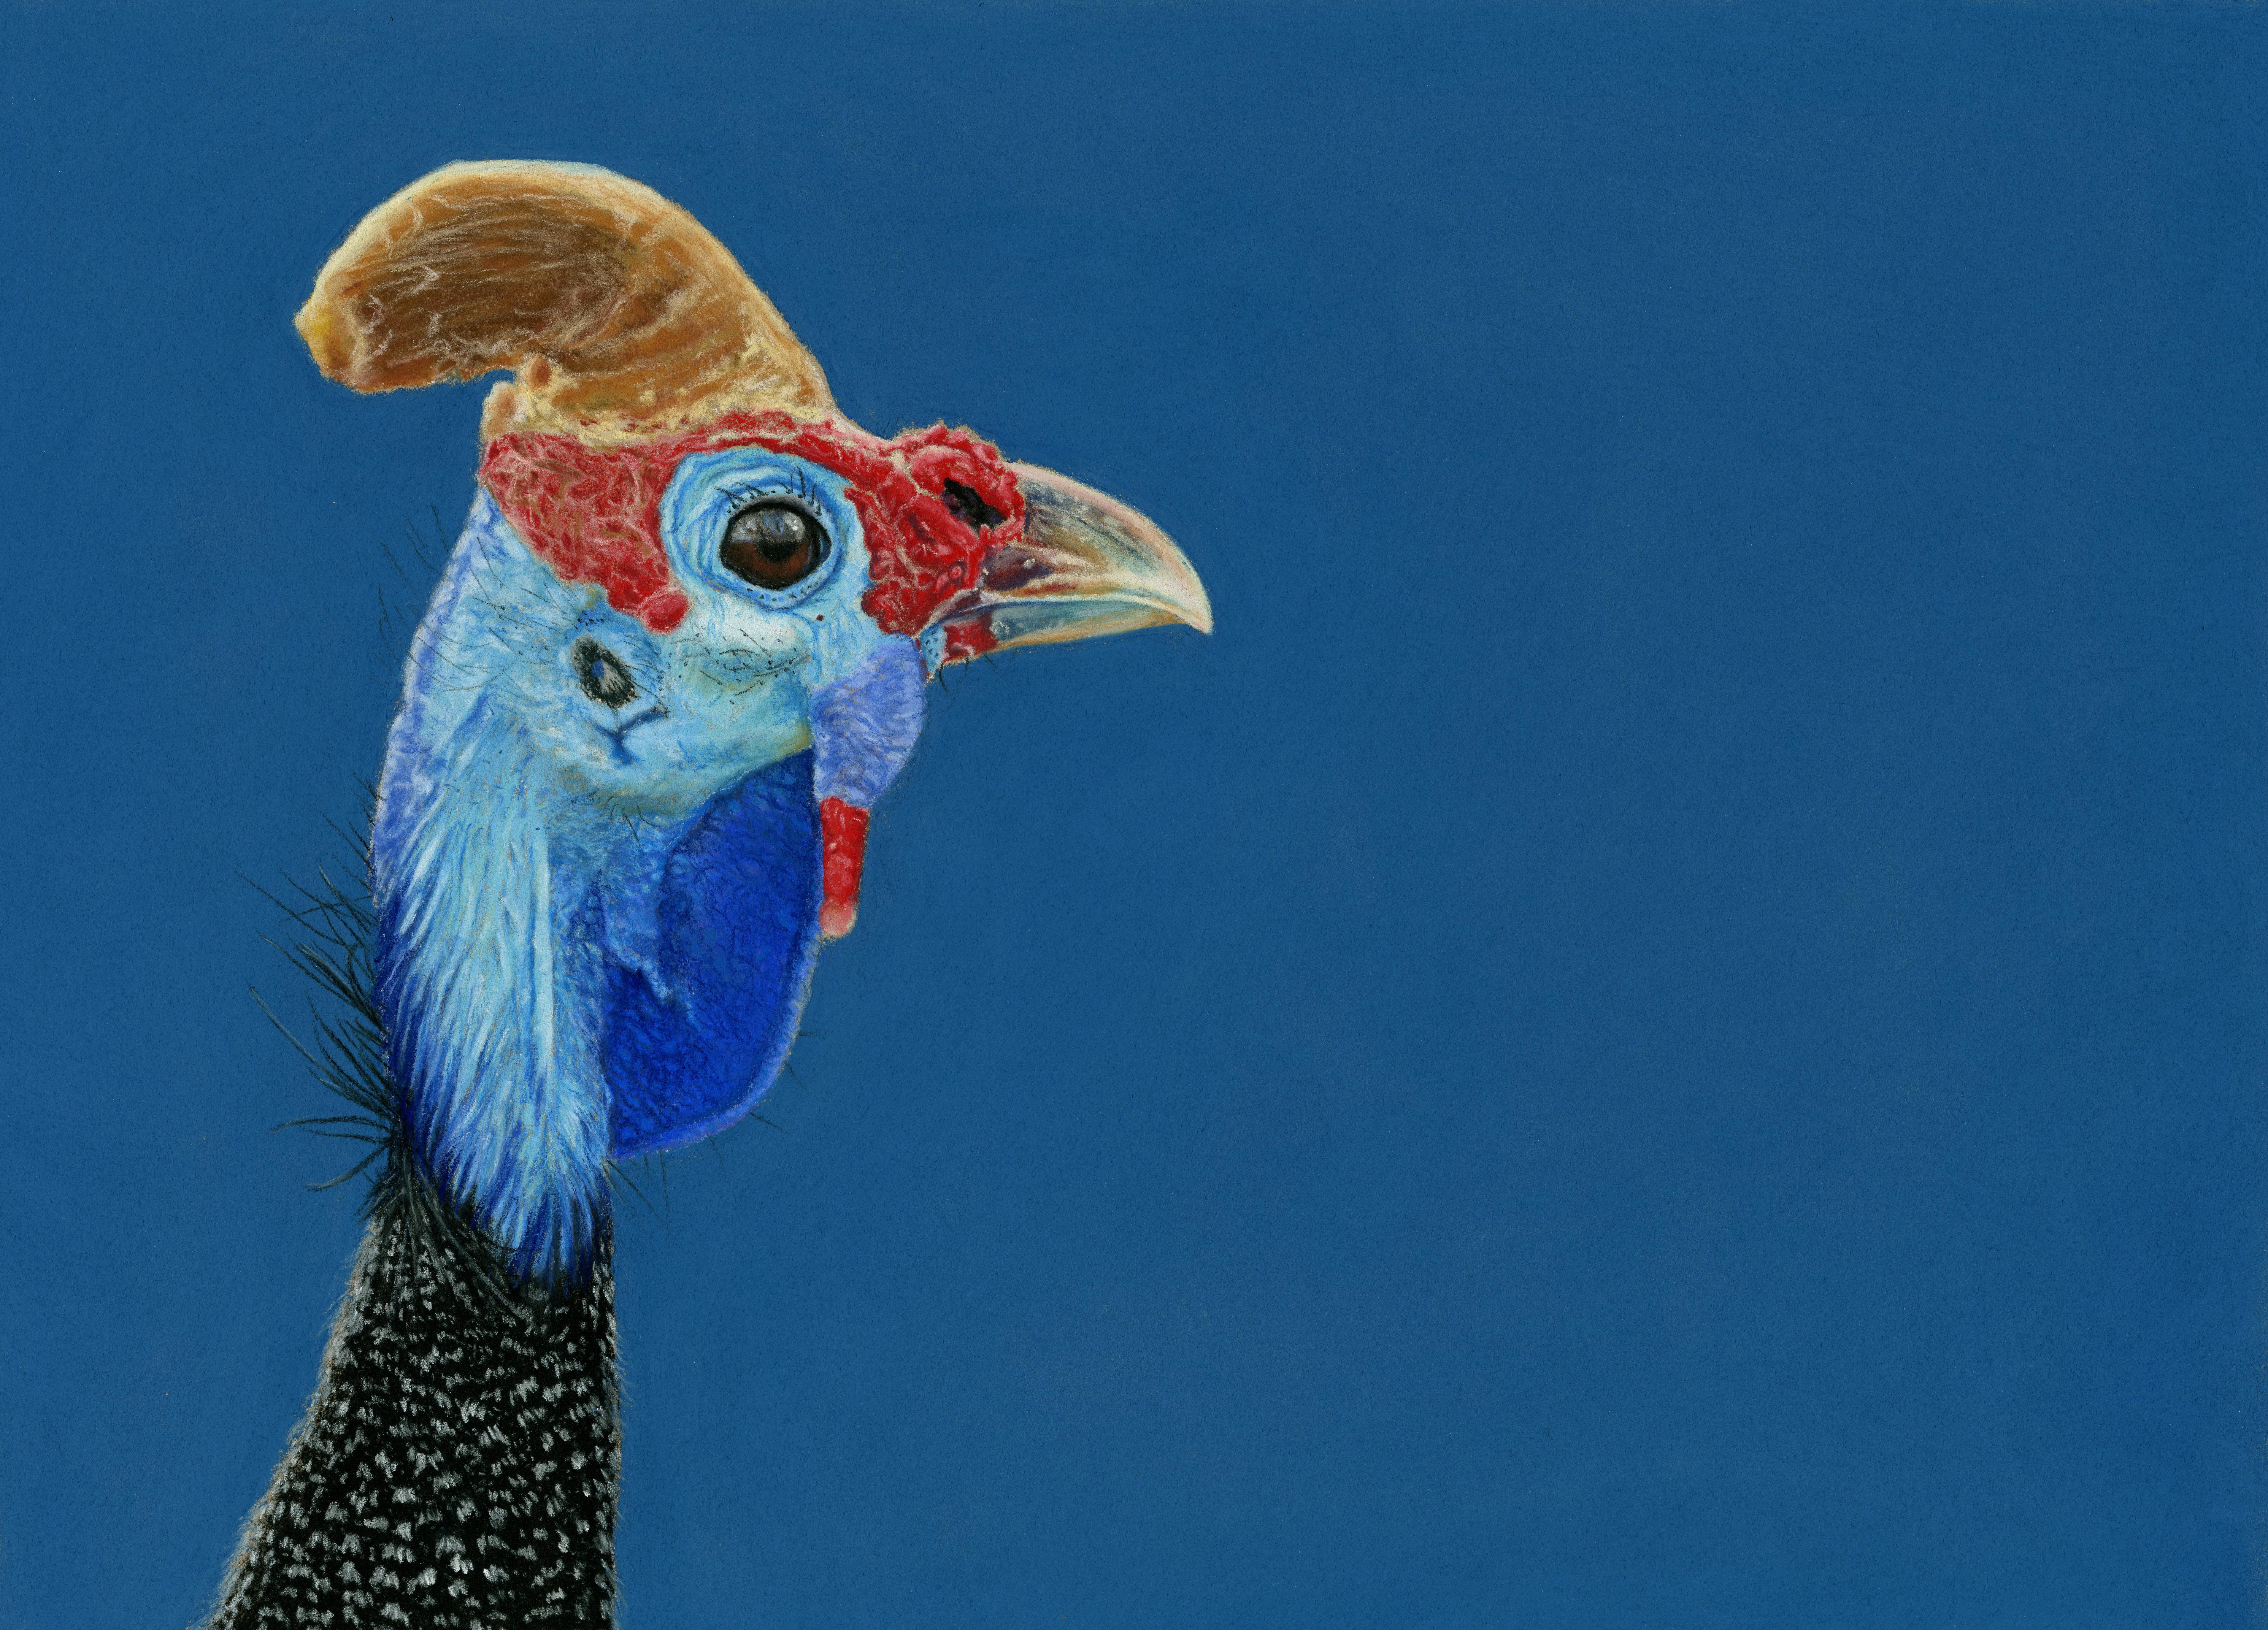 Guinea Fowl - Flamboyance